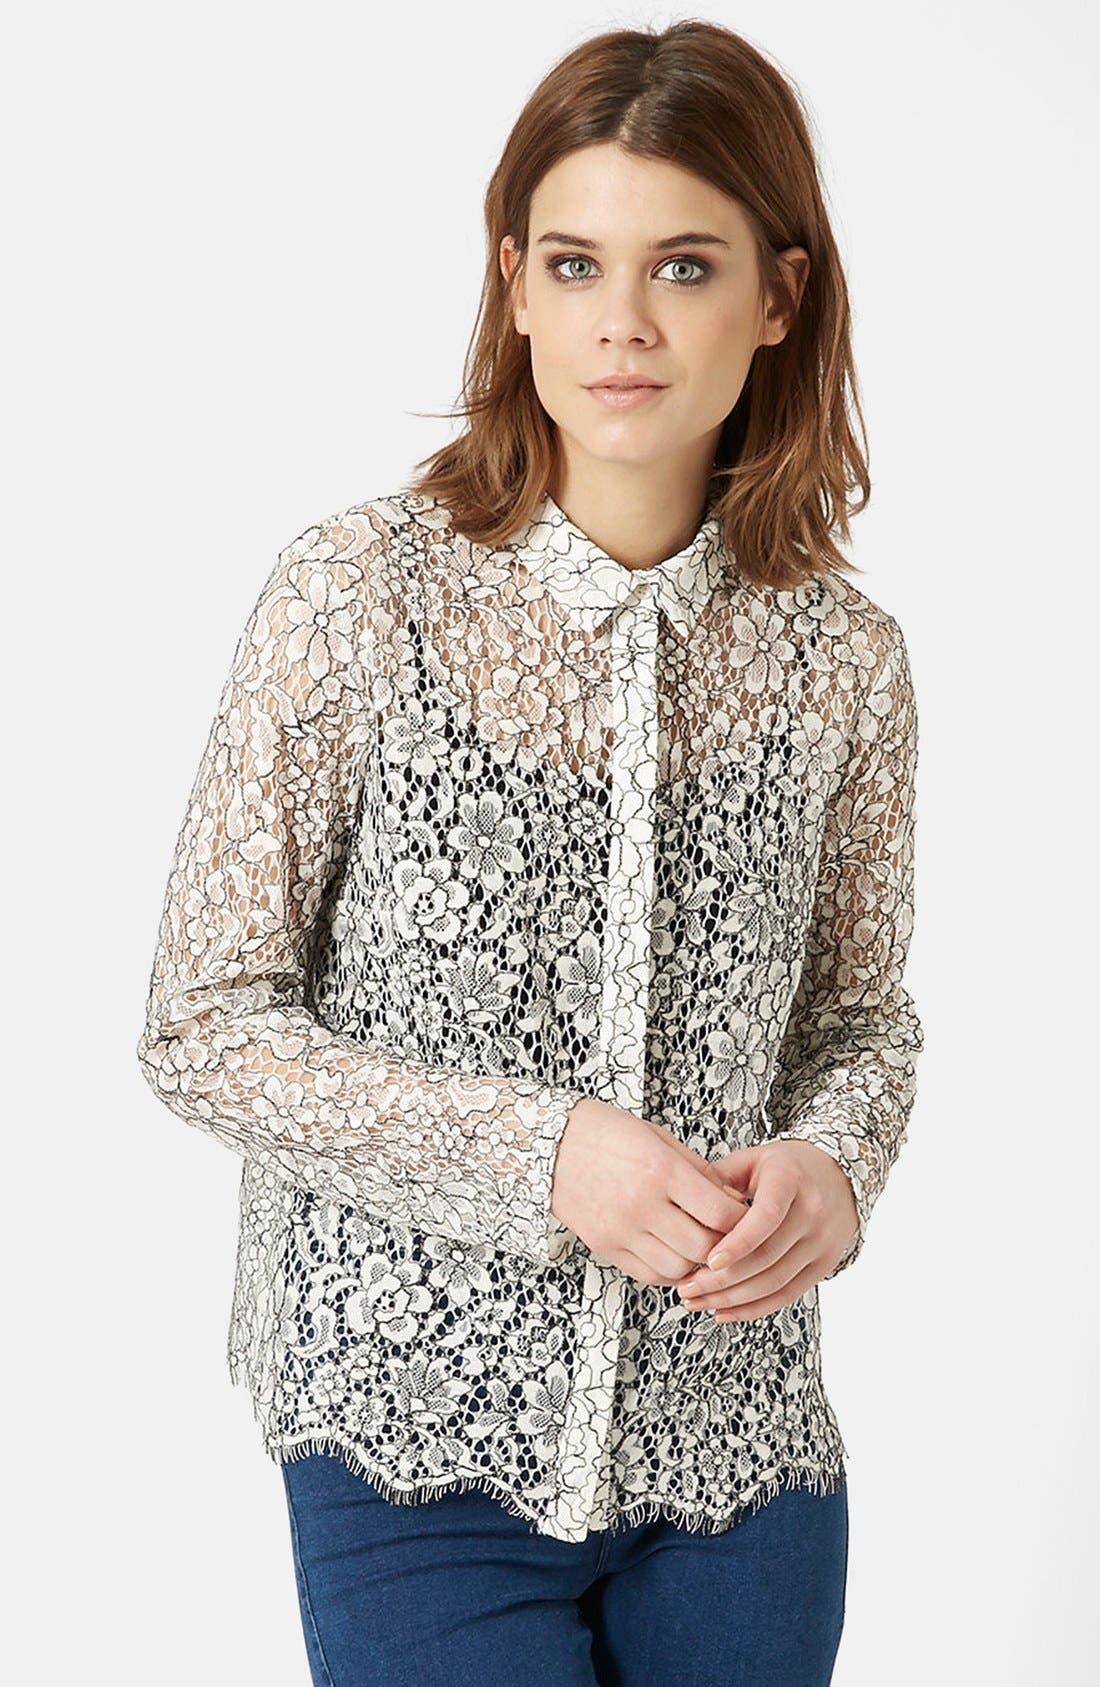 TOPSHOP, Scallop Lace Shirt, Main thumbnail 1, color, 900